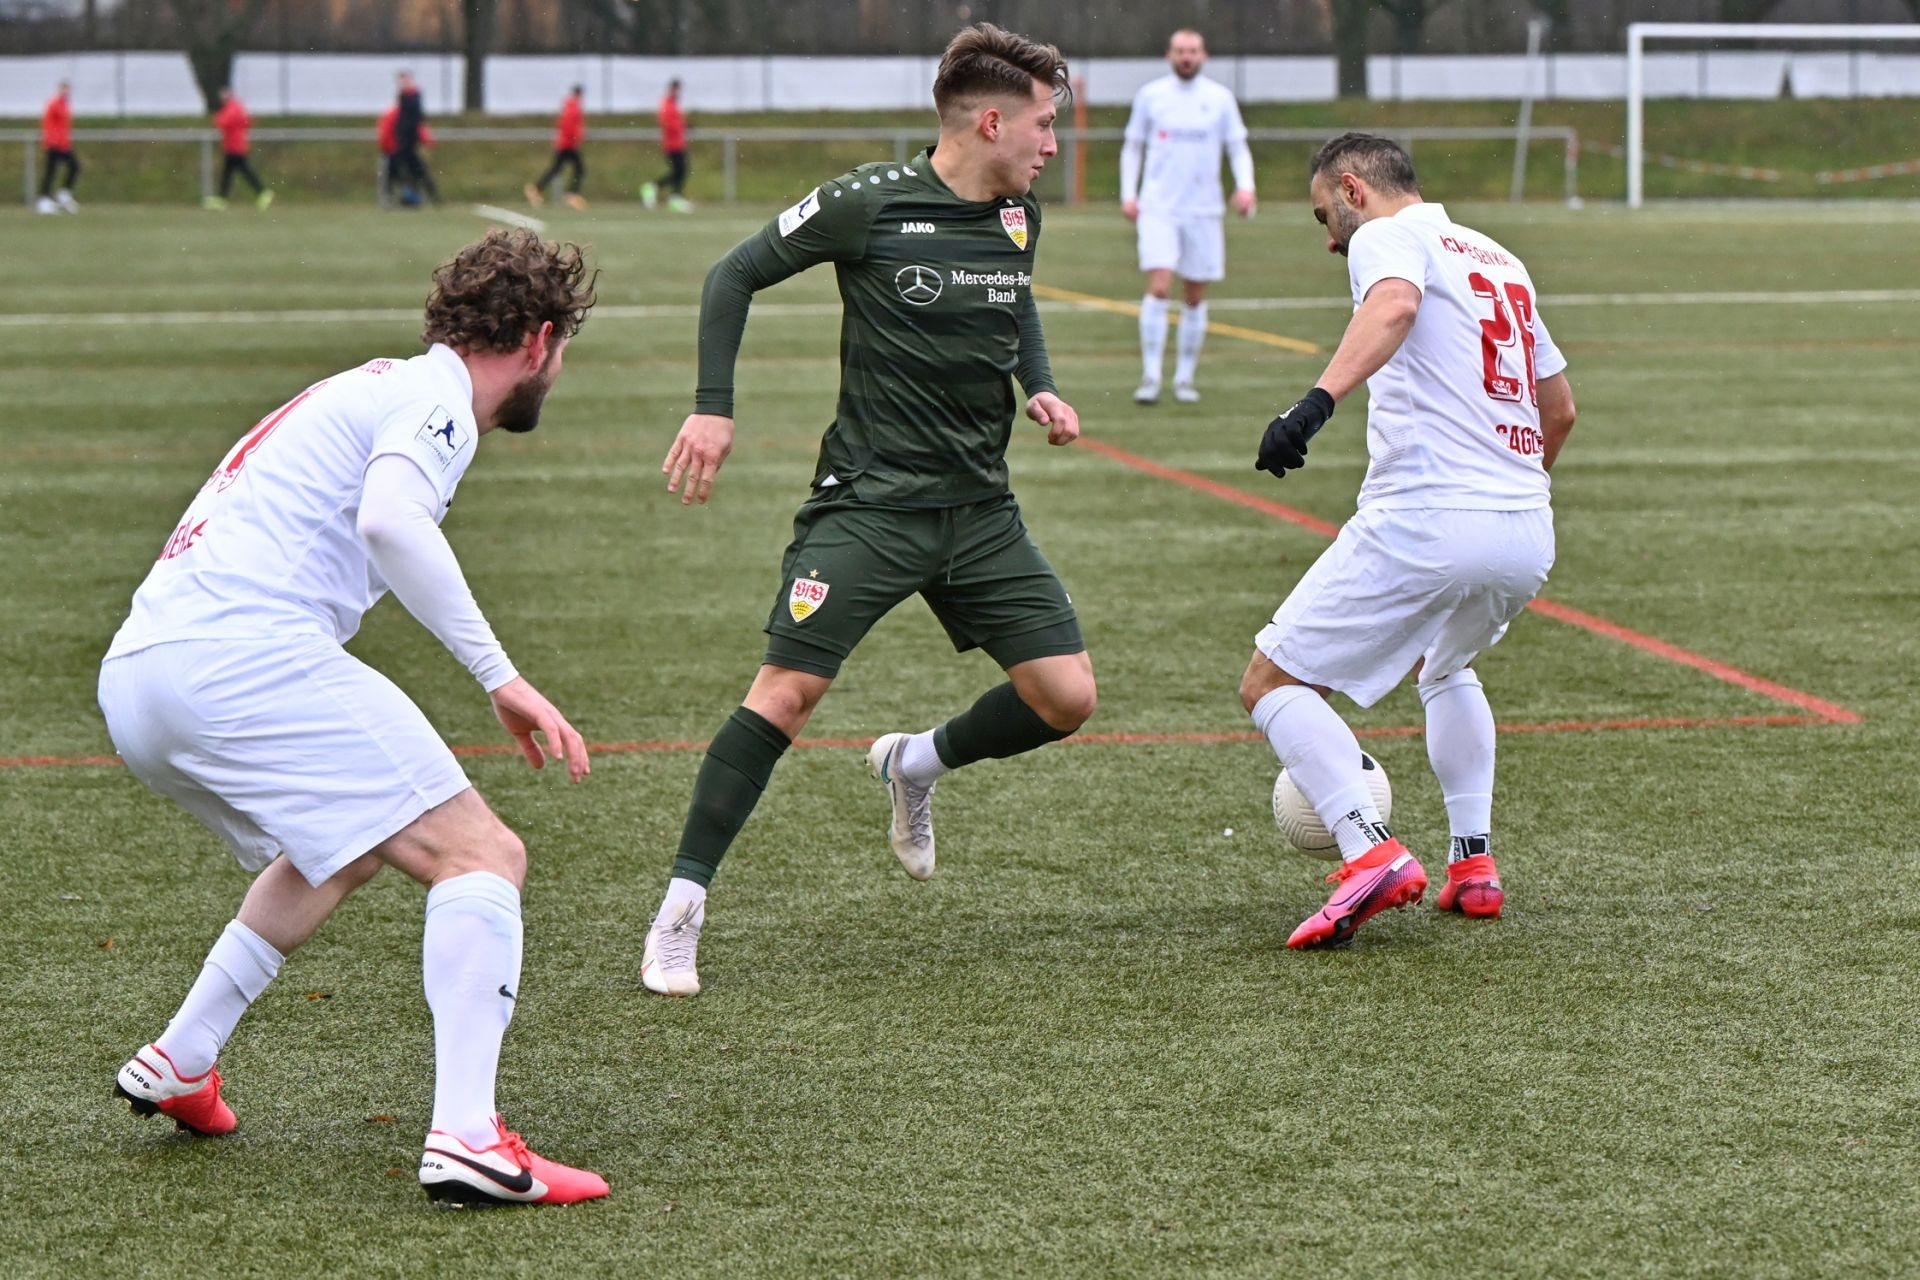 Regionalliga Südwest 2020/21, KSV Hessen Kassel, VfB Stuttgart II, Endstand 0:4, Ingmar Merle